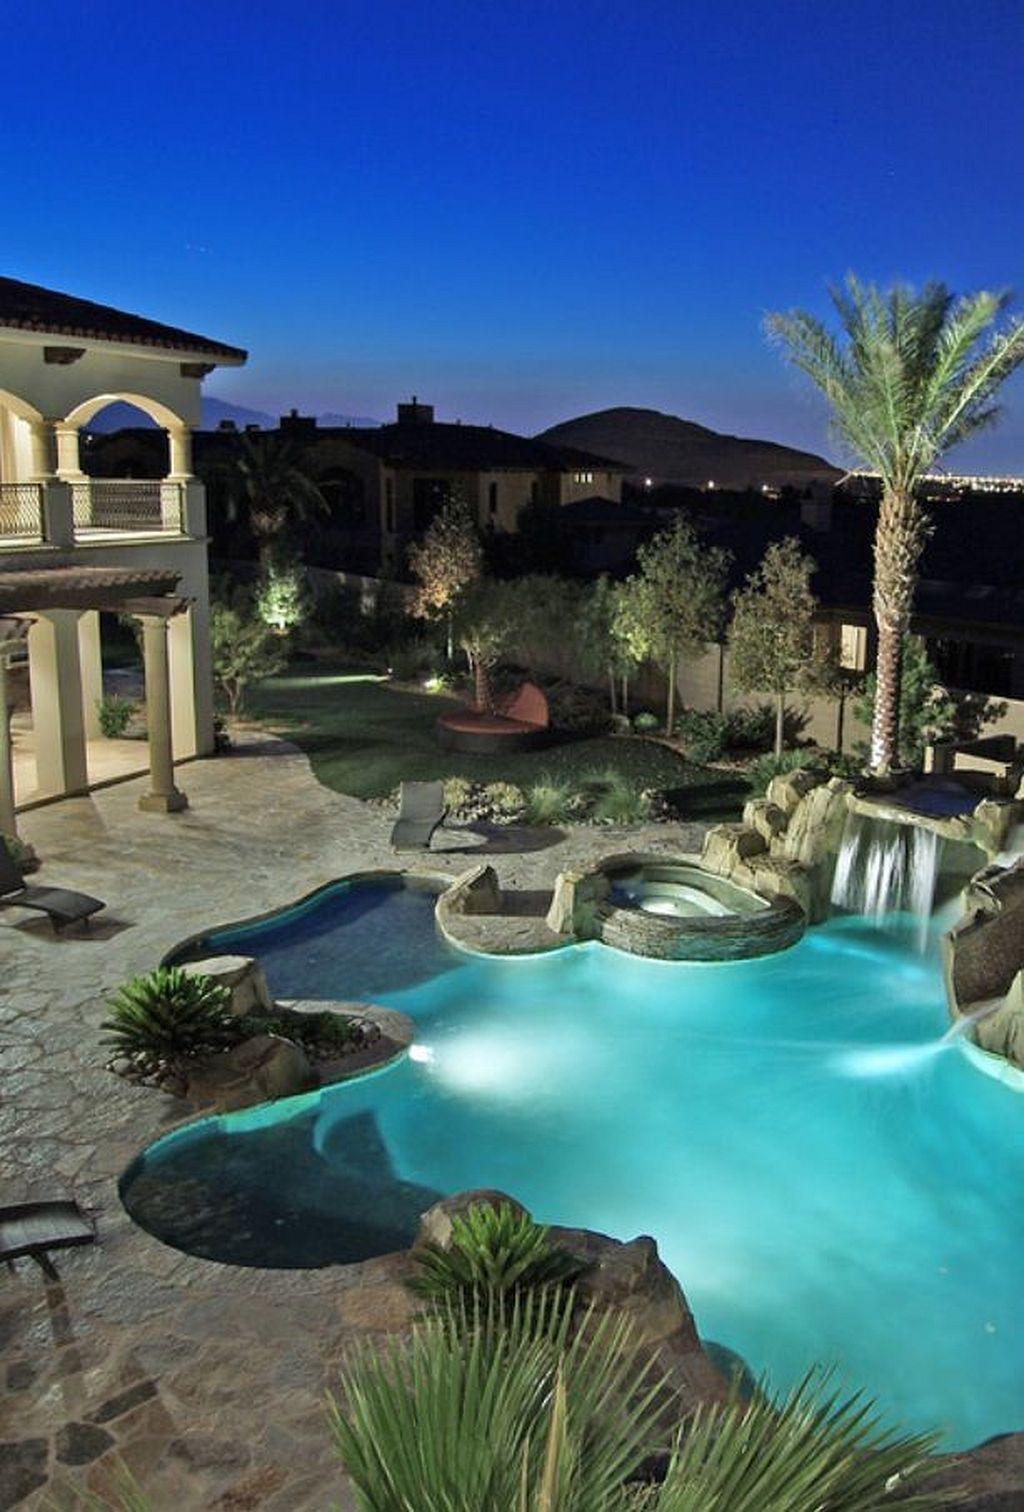 Awesome Backyard Patio Ideas With Beautiful Pool 40